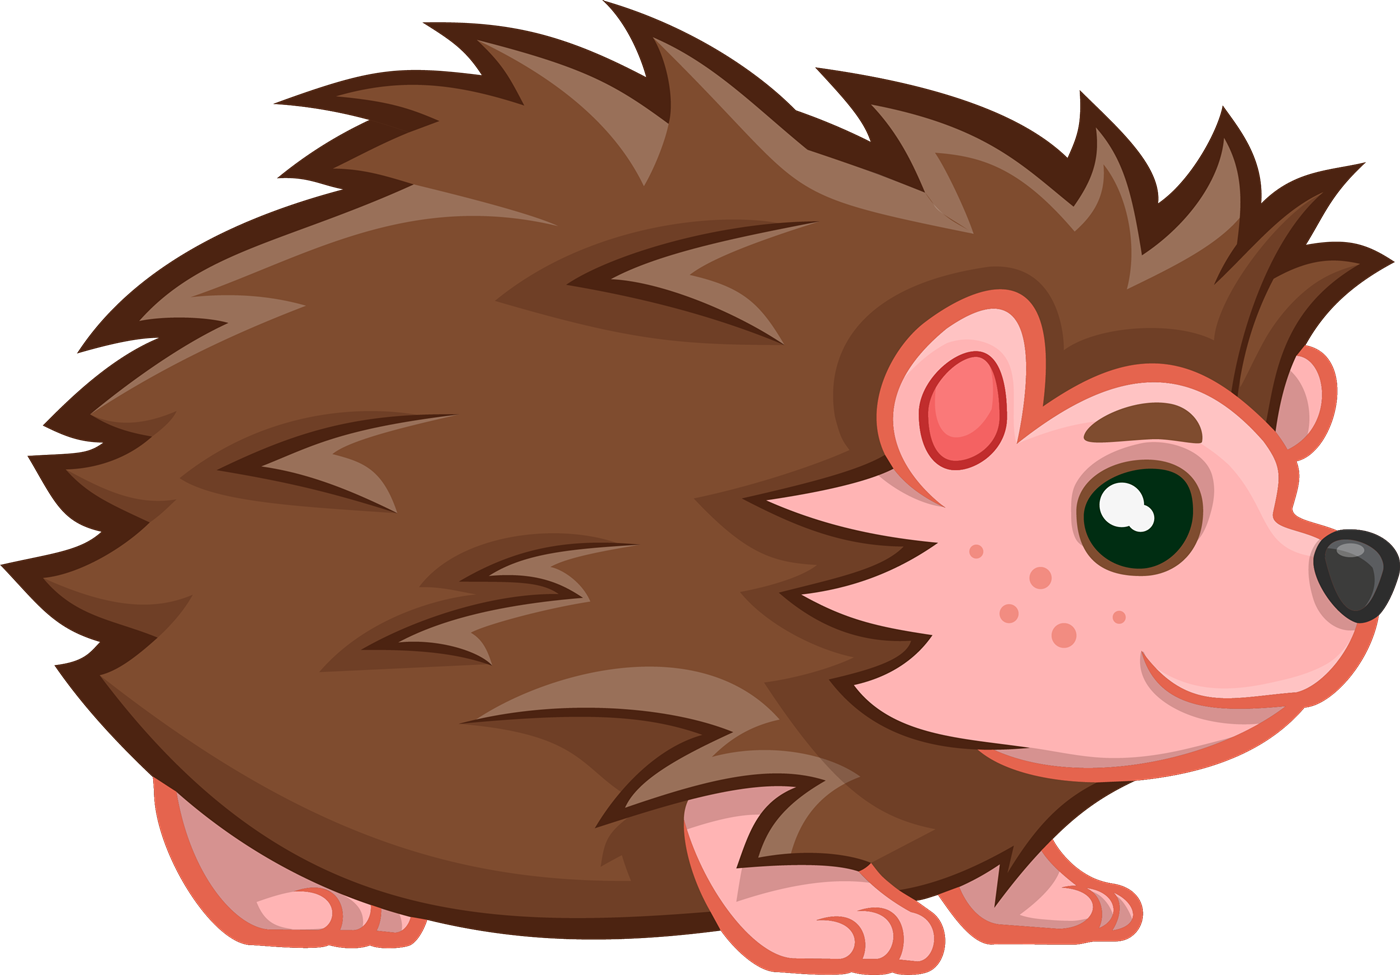 Hedgehog clipart #10, Download drawings